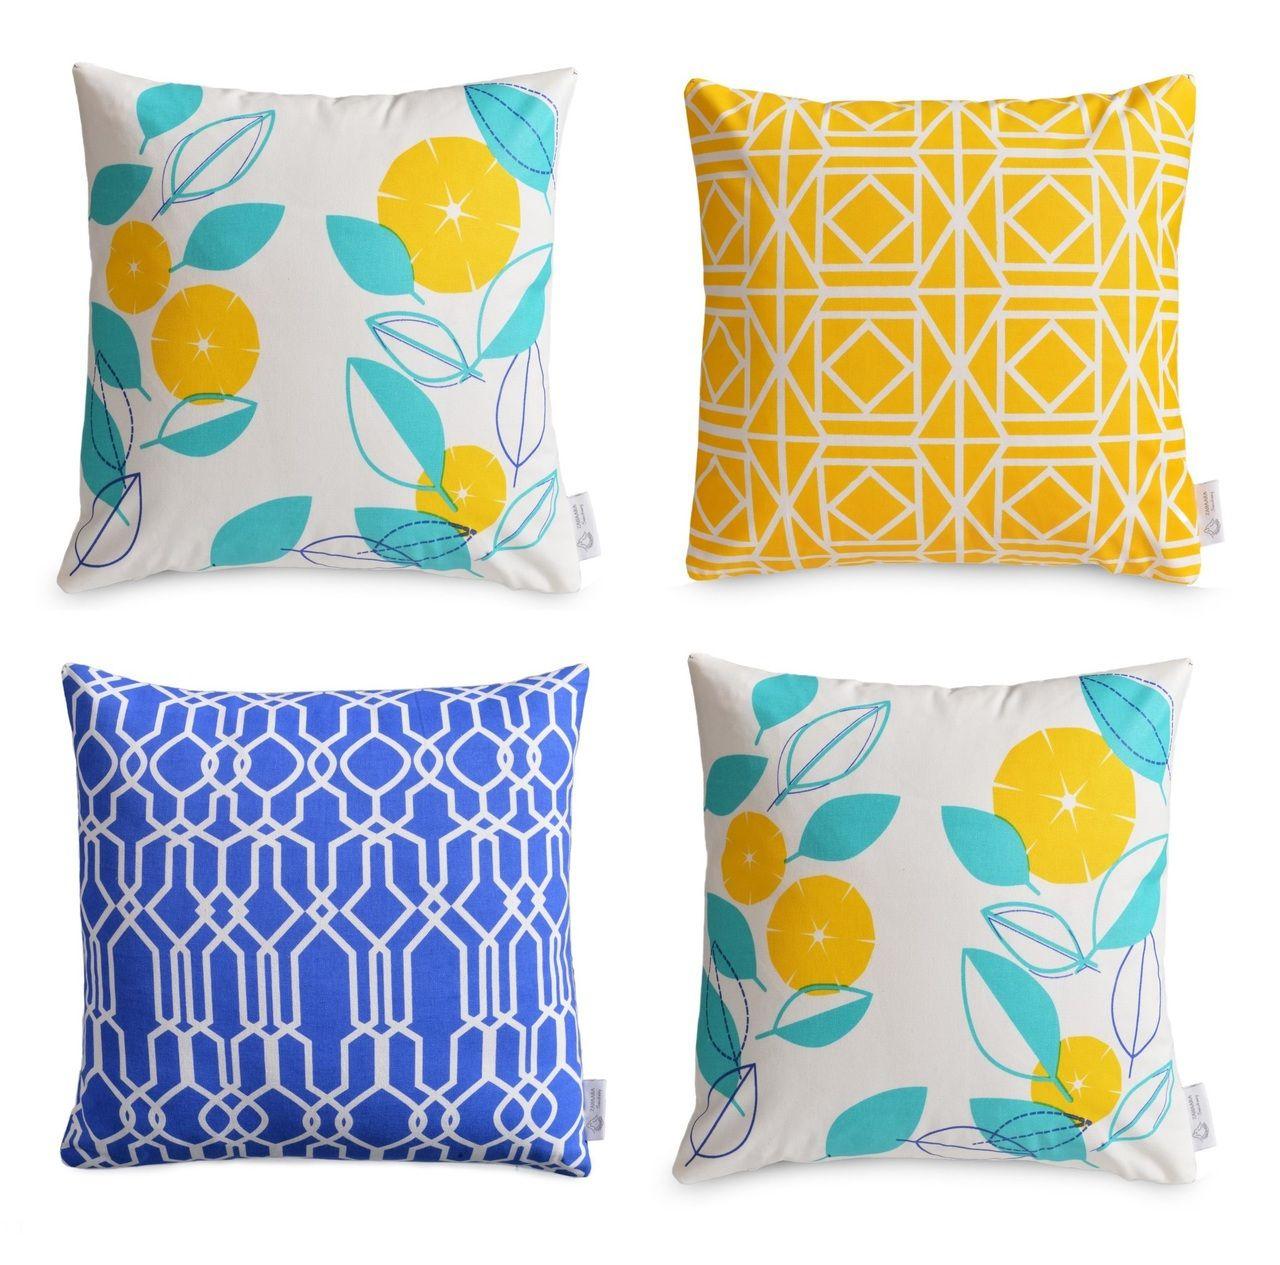 4 X Geometric/Floral WATERPROOF OUTDOOR Cushion Covers   Greek Blue,  Yellow, Aqua